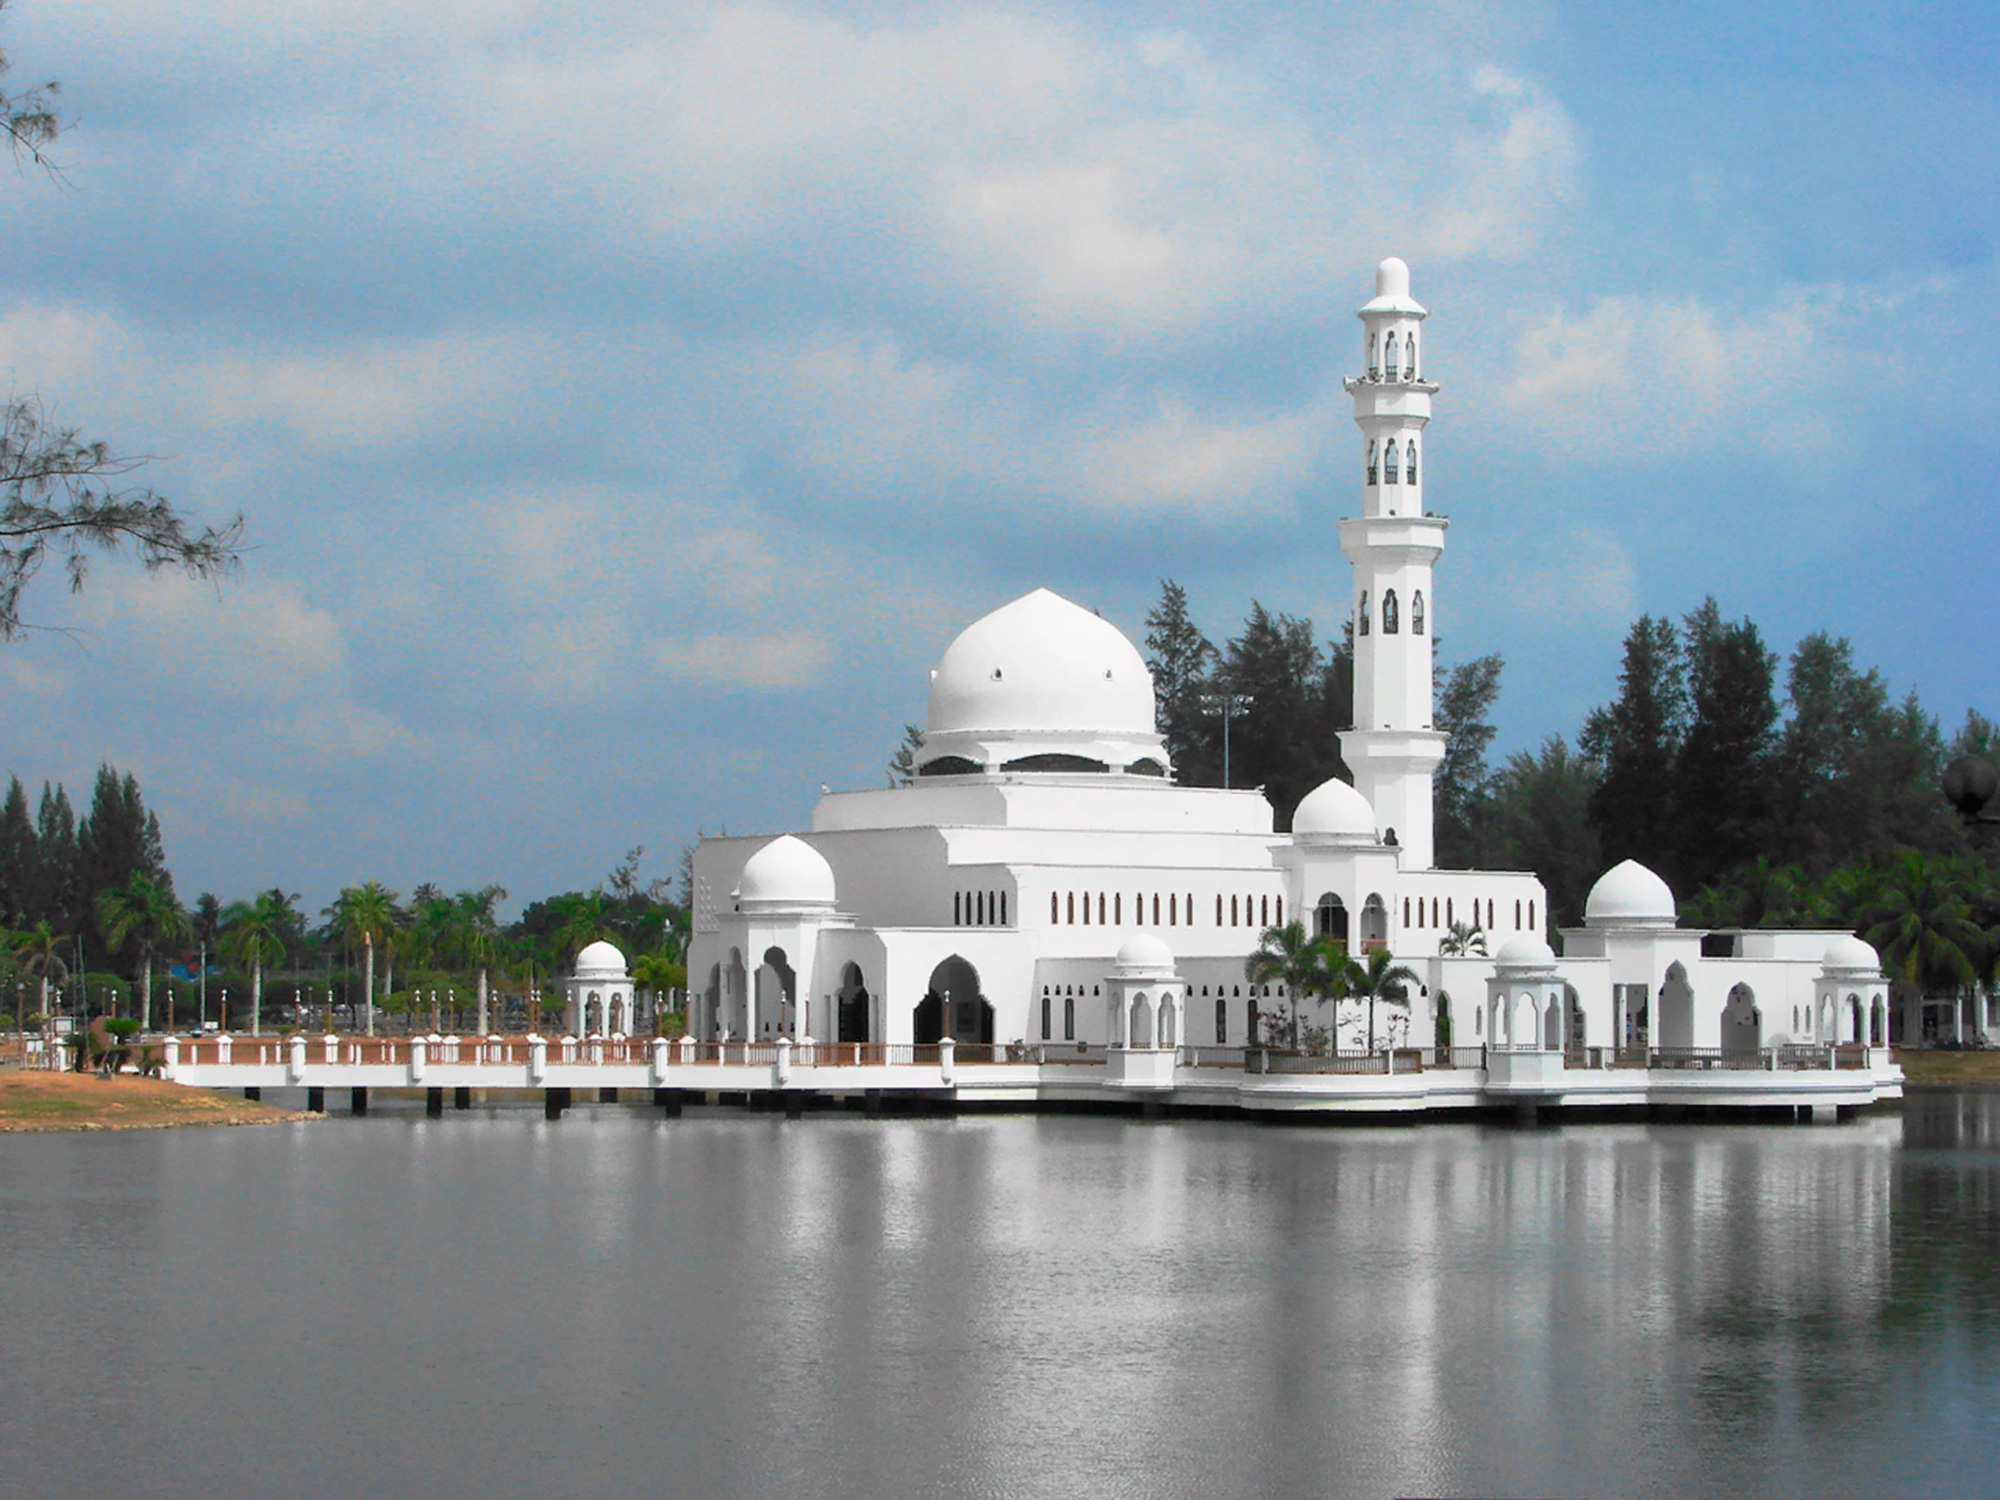 Мечеть Тенгку Тенга Захара (Малайзия)